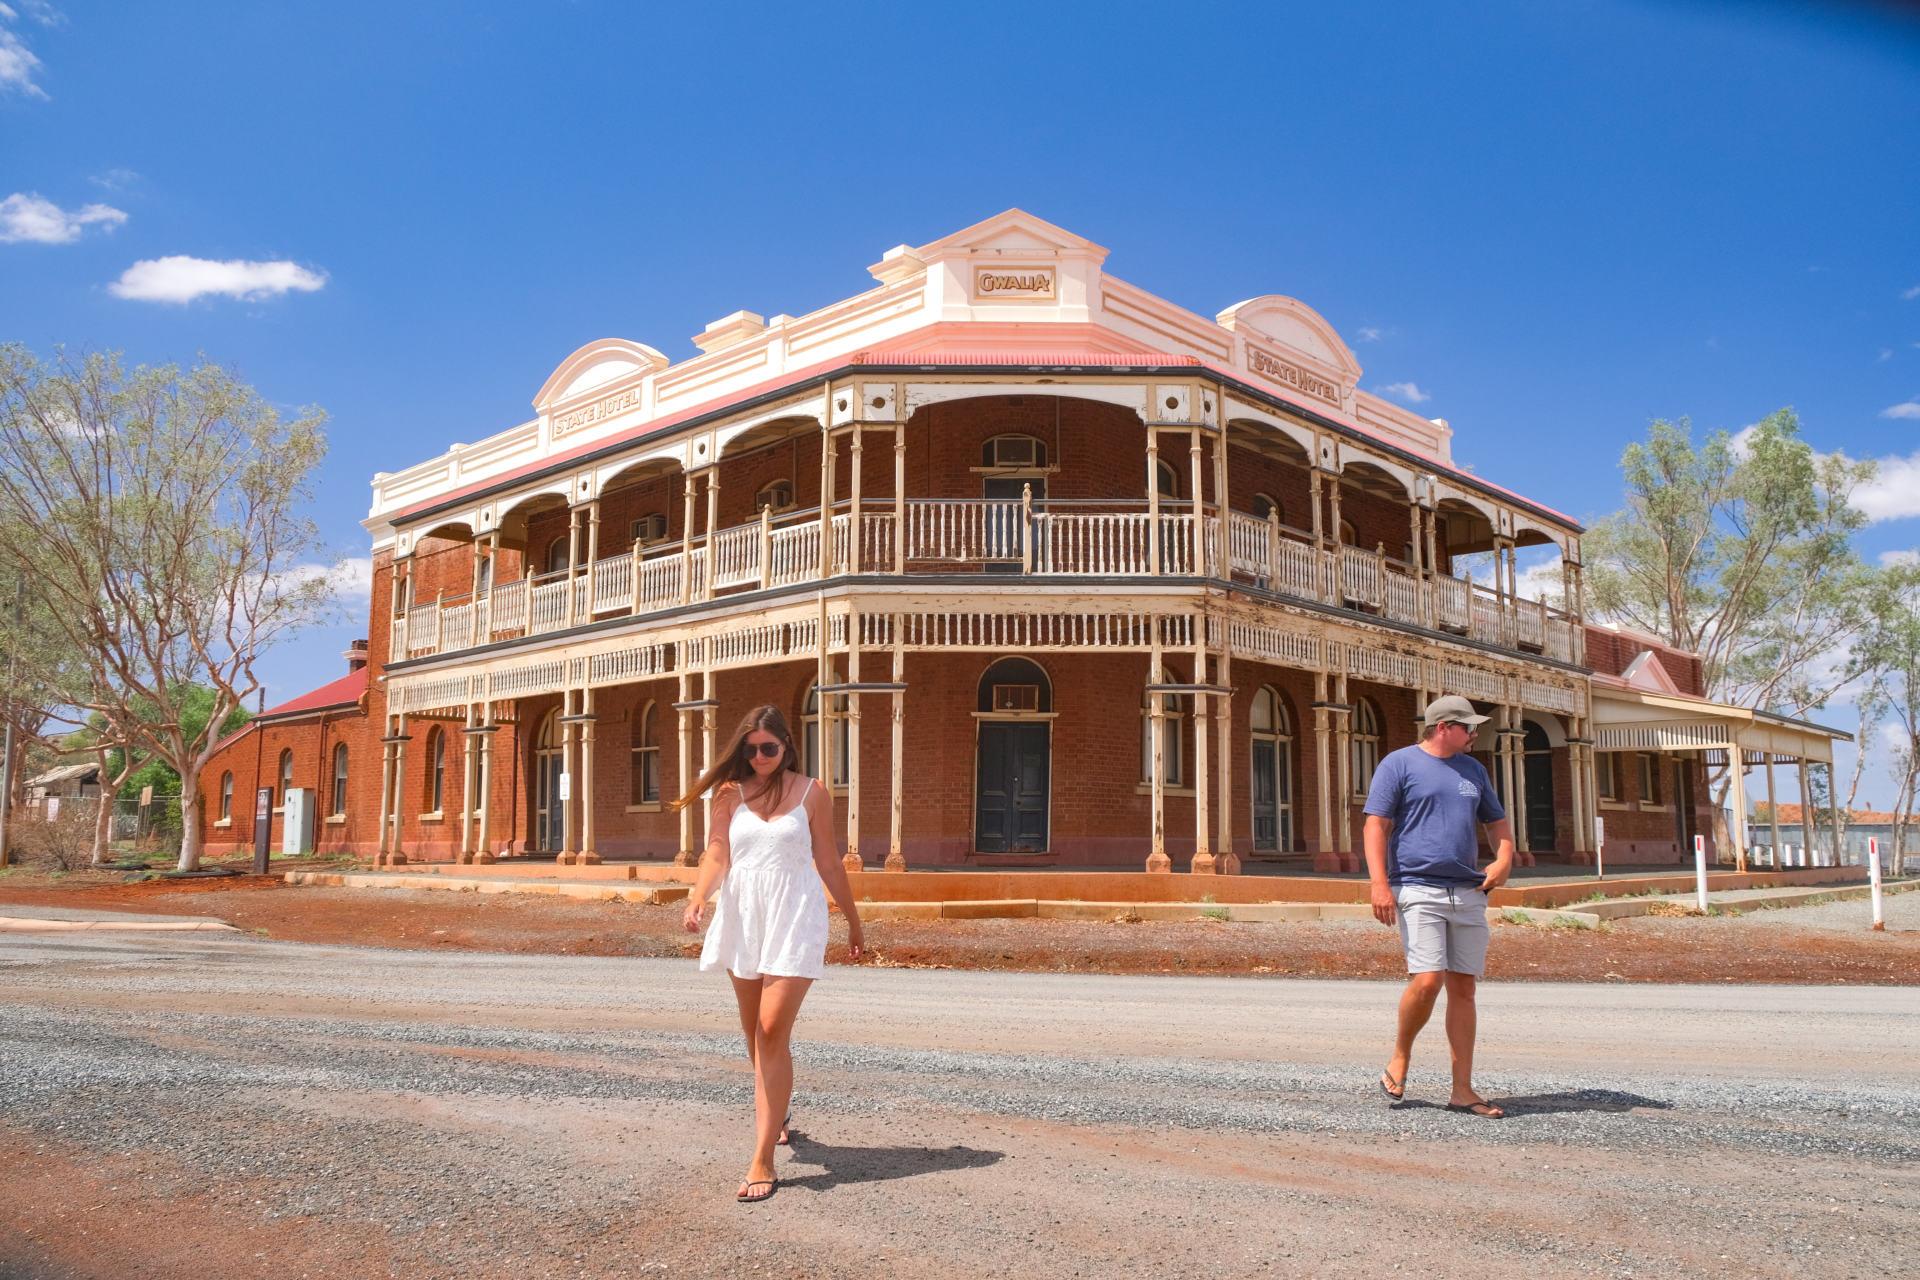 gwalia ghost town state hotel